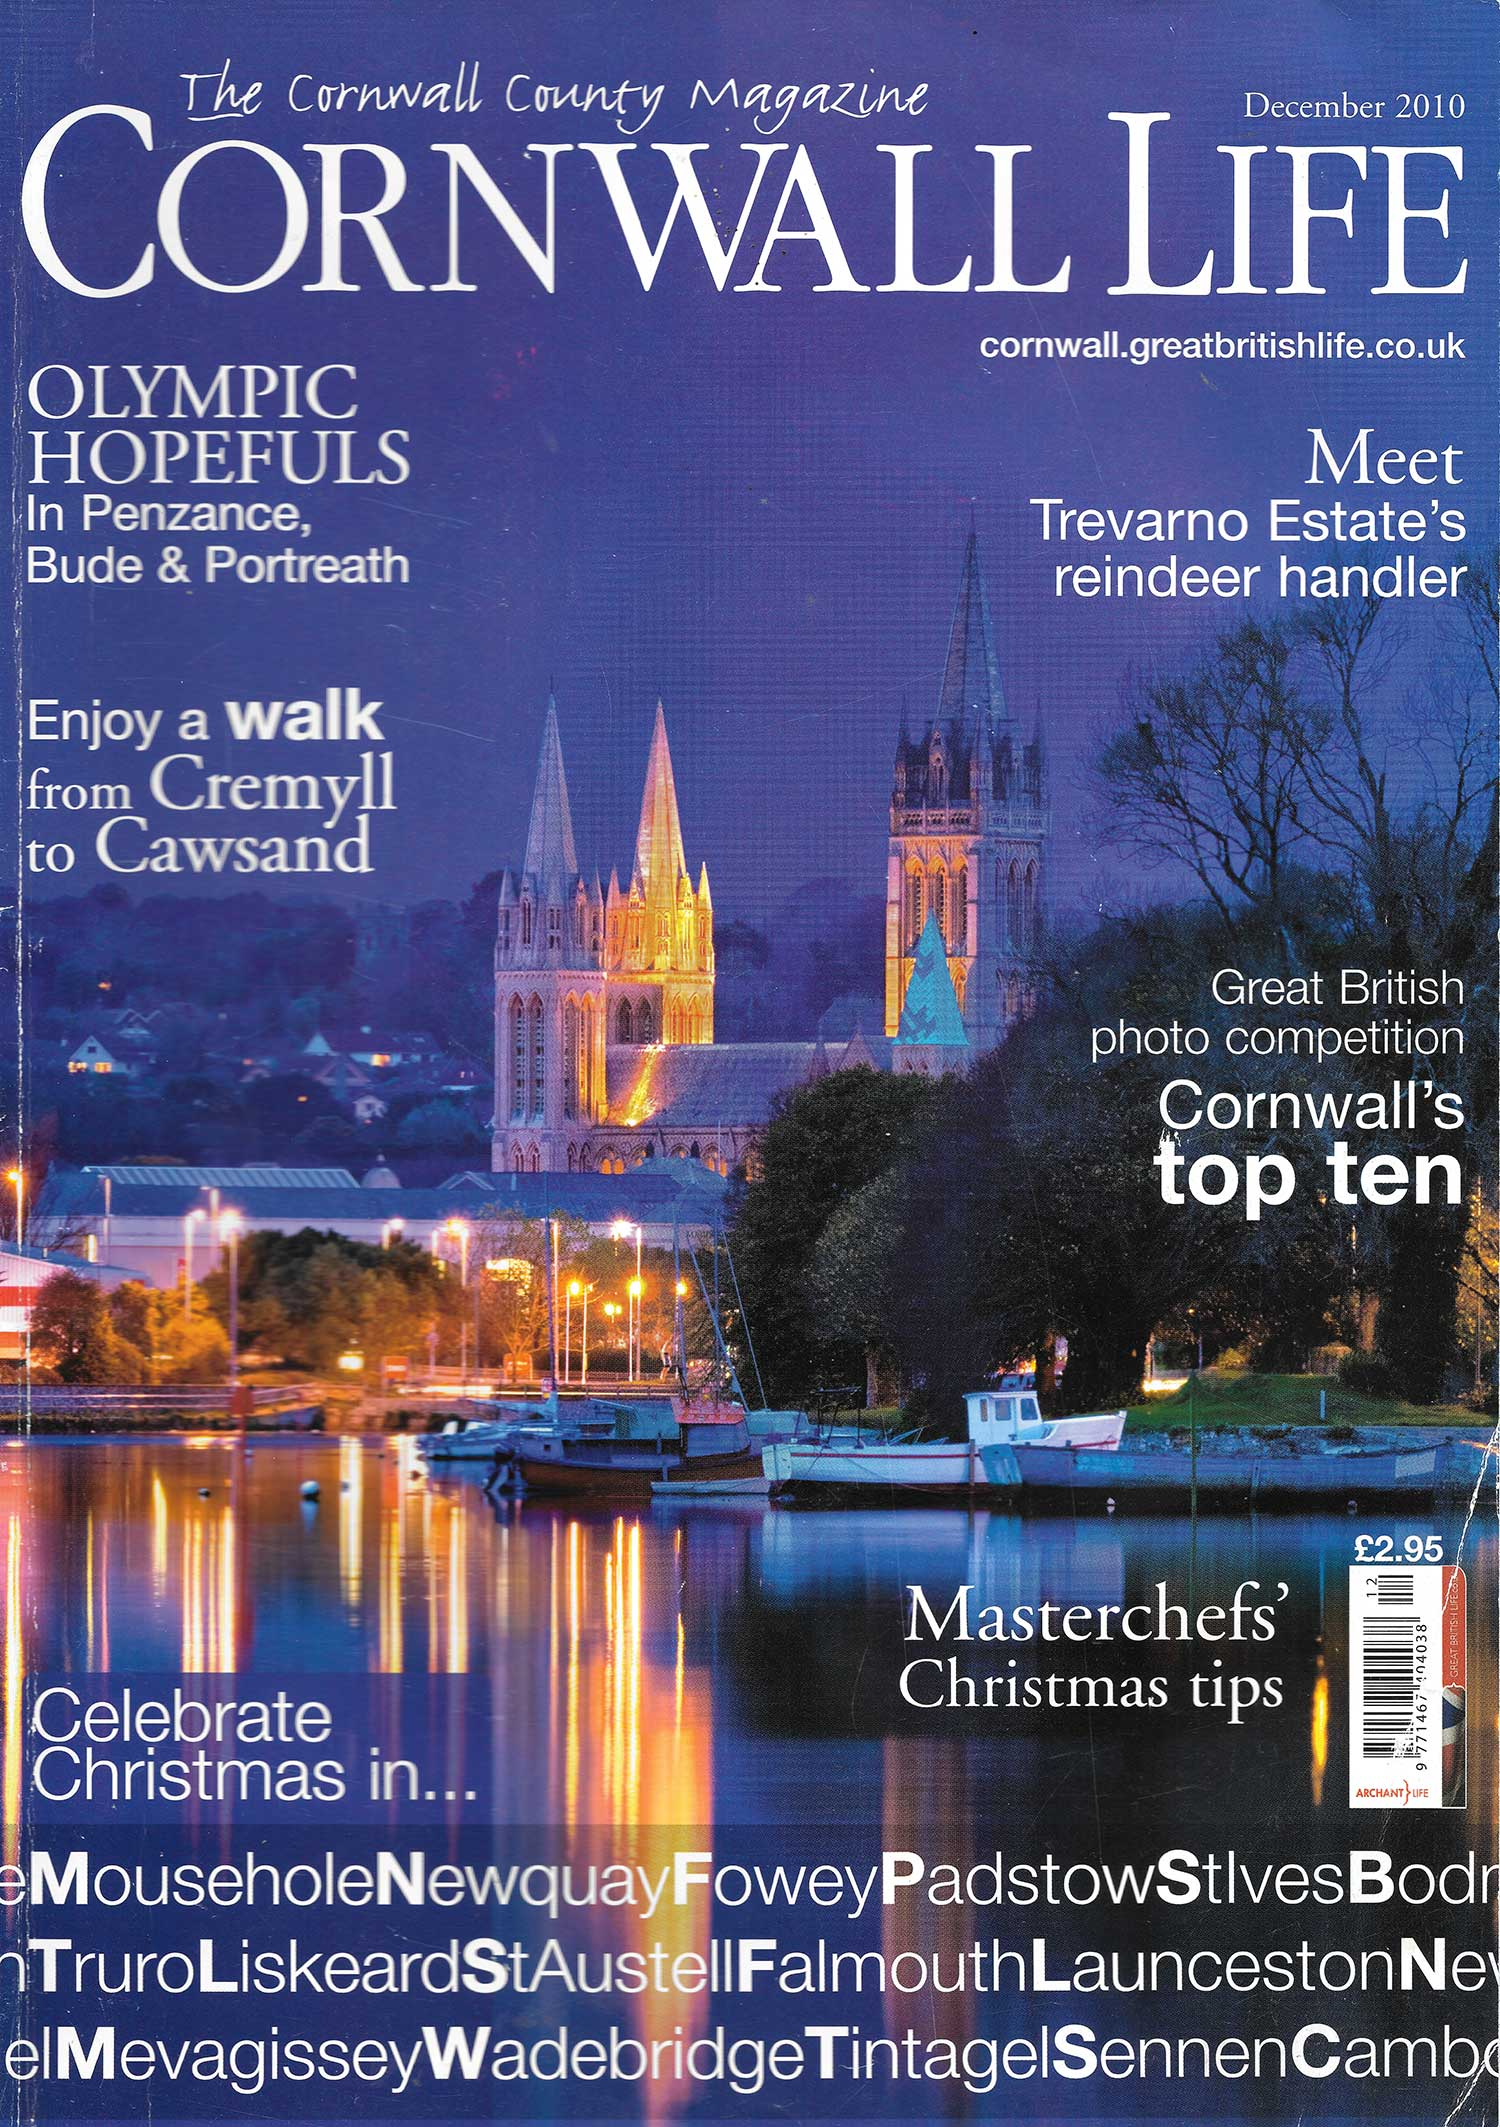 glasswing-jewellery-cornwall-life-magazine-cover.jpg